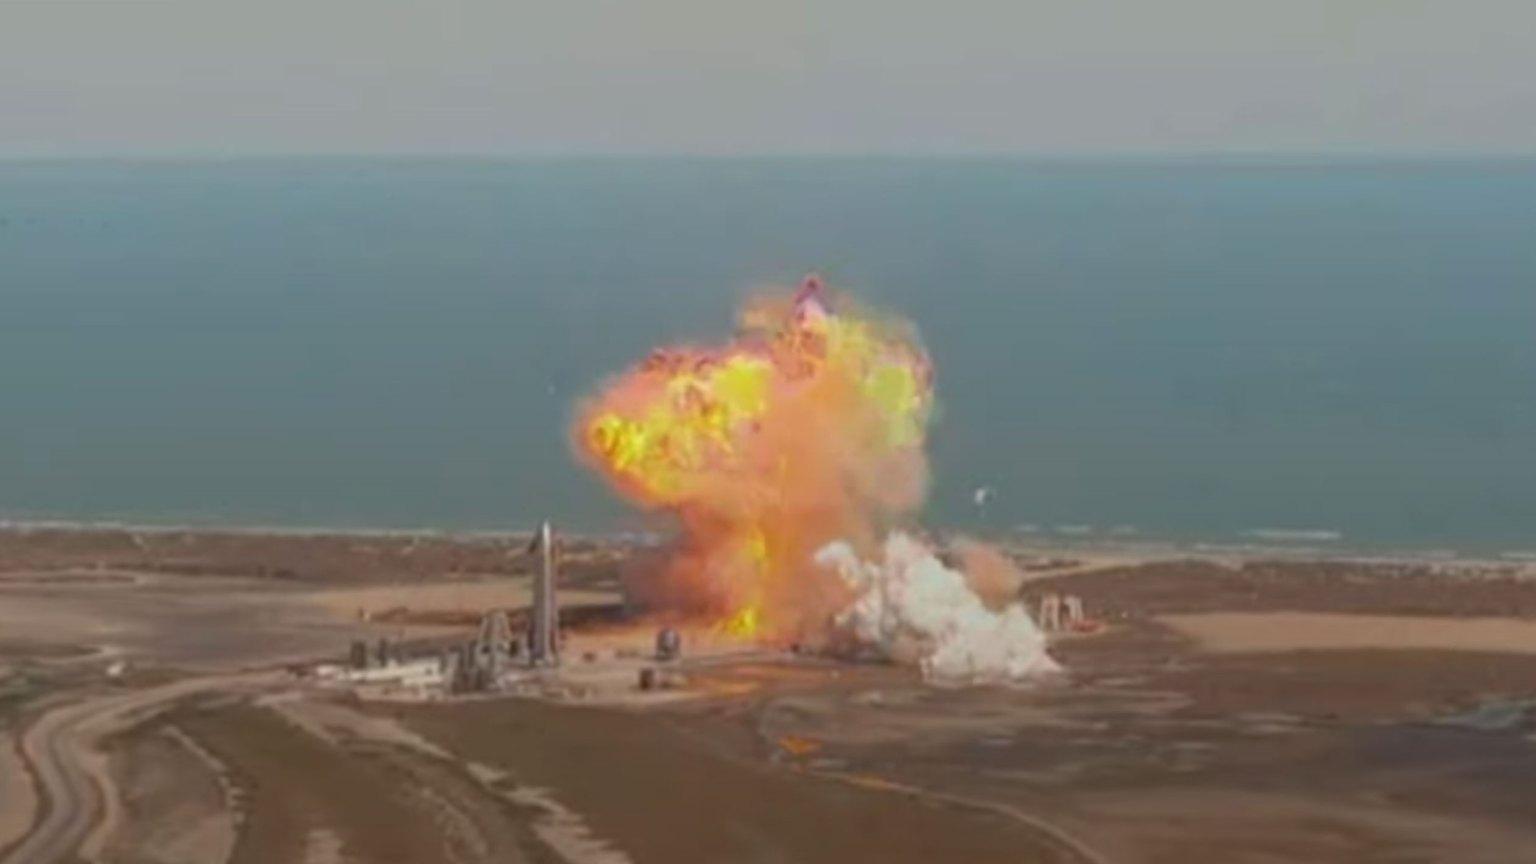 SpaceX Mars rocket prototype explodes on landing